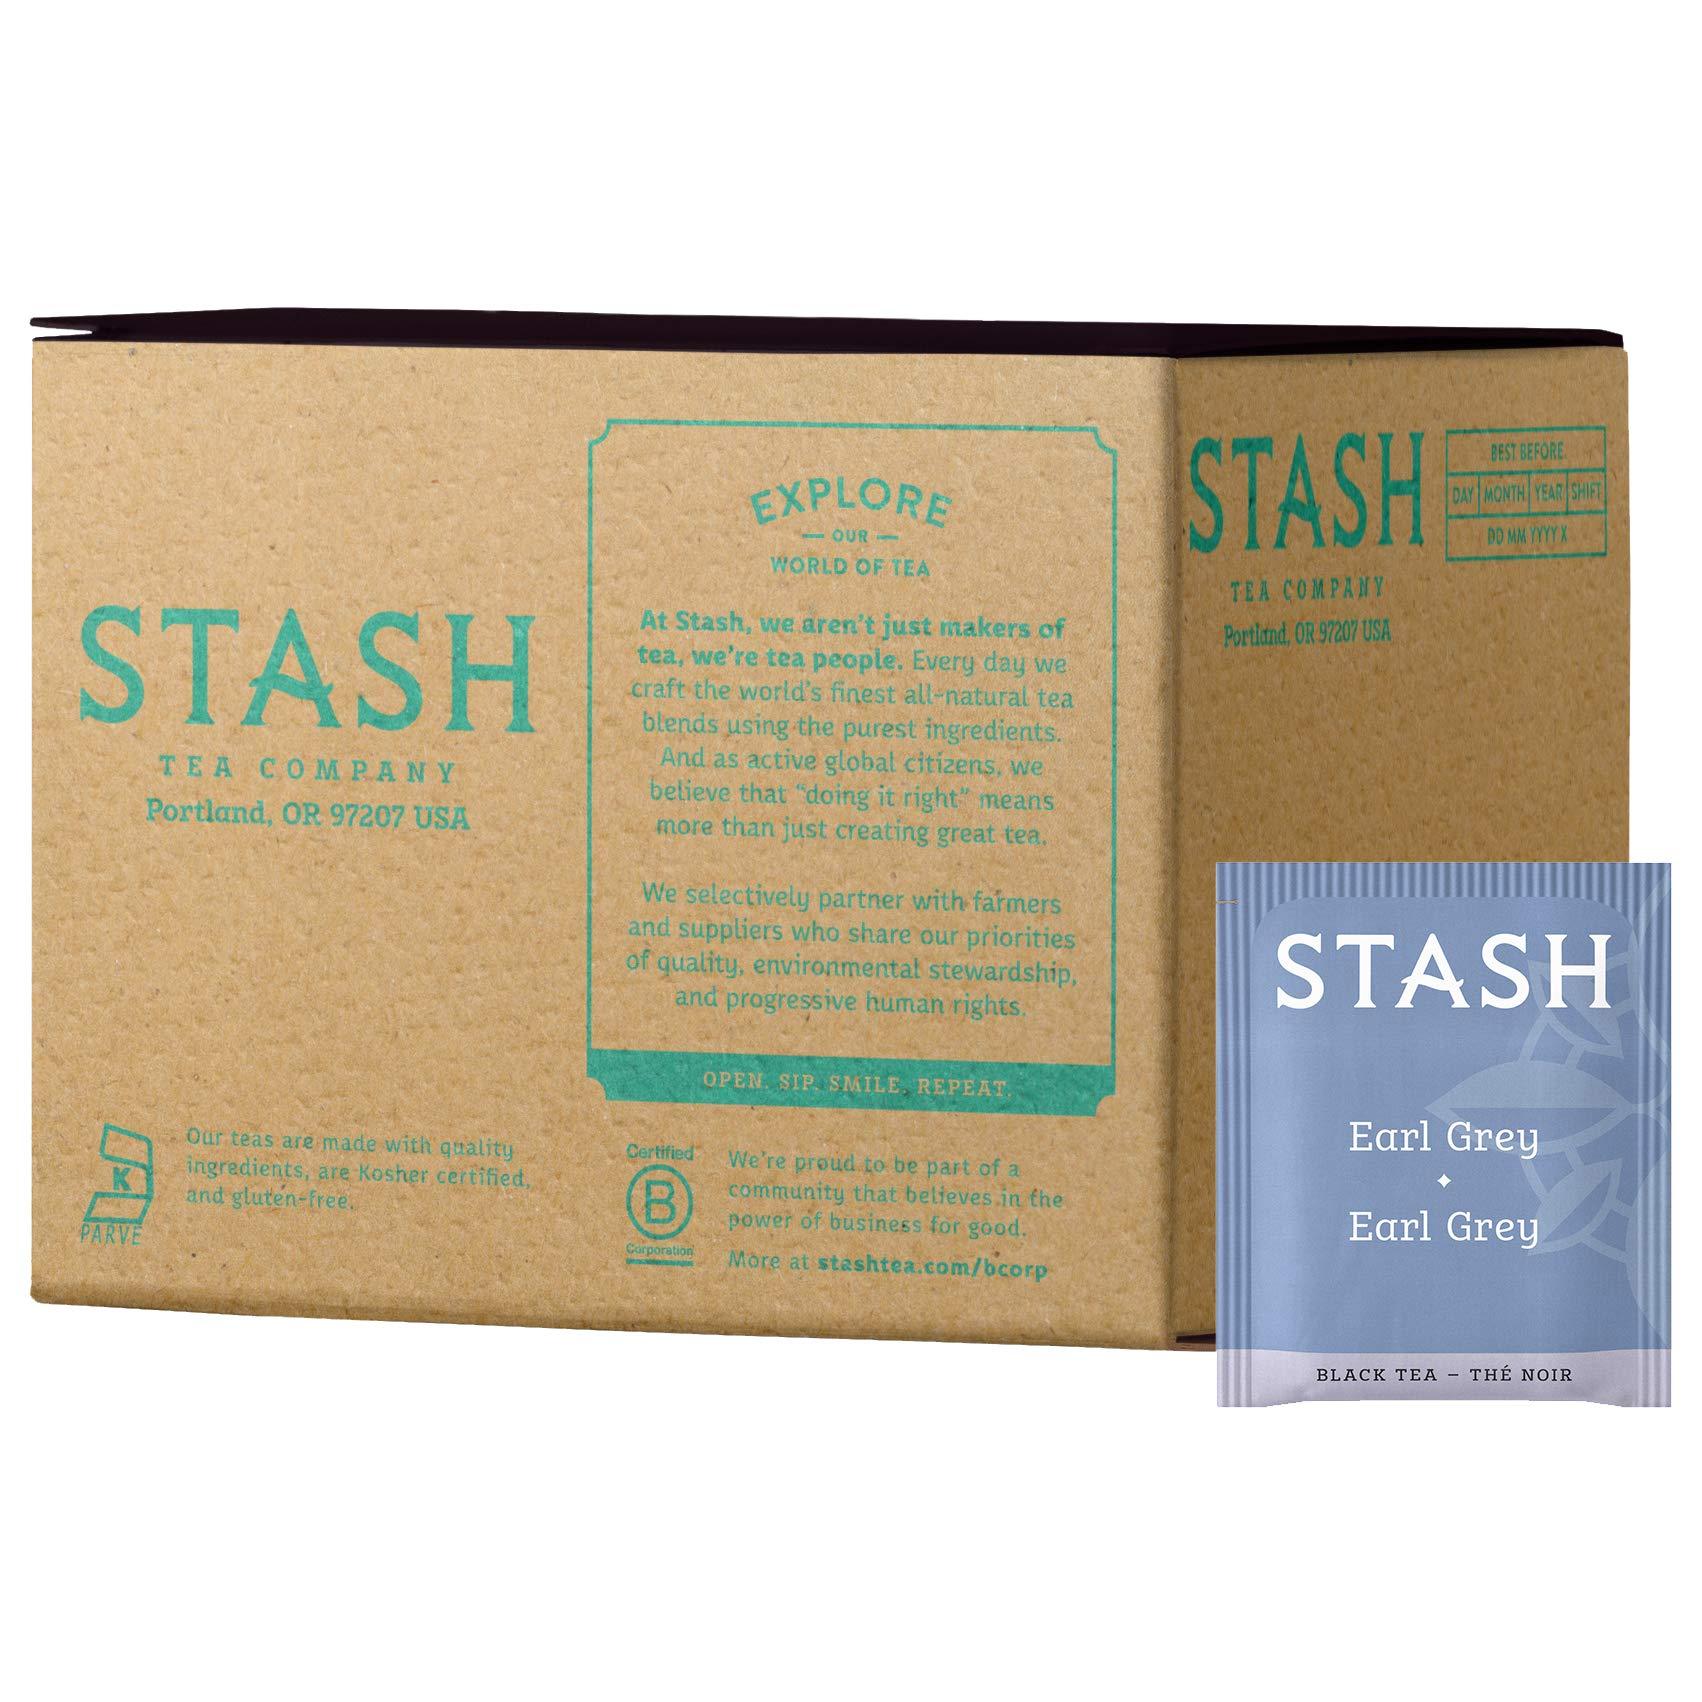 Stash Tea Earl Grey Black Tea, 100 Count Box of Tea Bags in Foil (packaging may vary) Full Caffeine Tea, Black Tea with Bergamot, Enjoy Hot or Iced